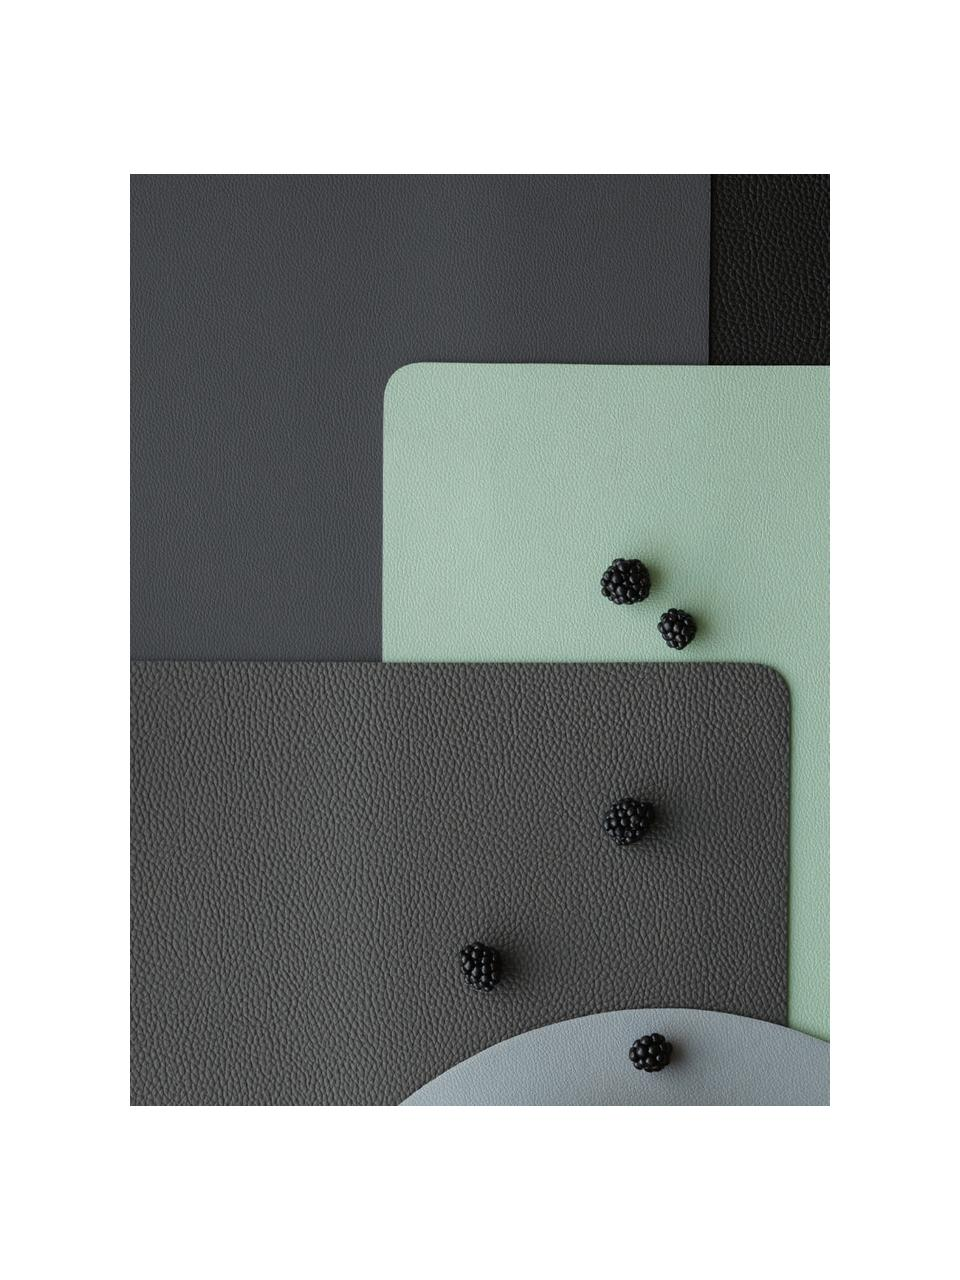 Tovaglietta americana in similpelle Pik 2 pz, Materiale sintetico (PVC), Verde menta, Larg. 33 x Lung. 46 cm